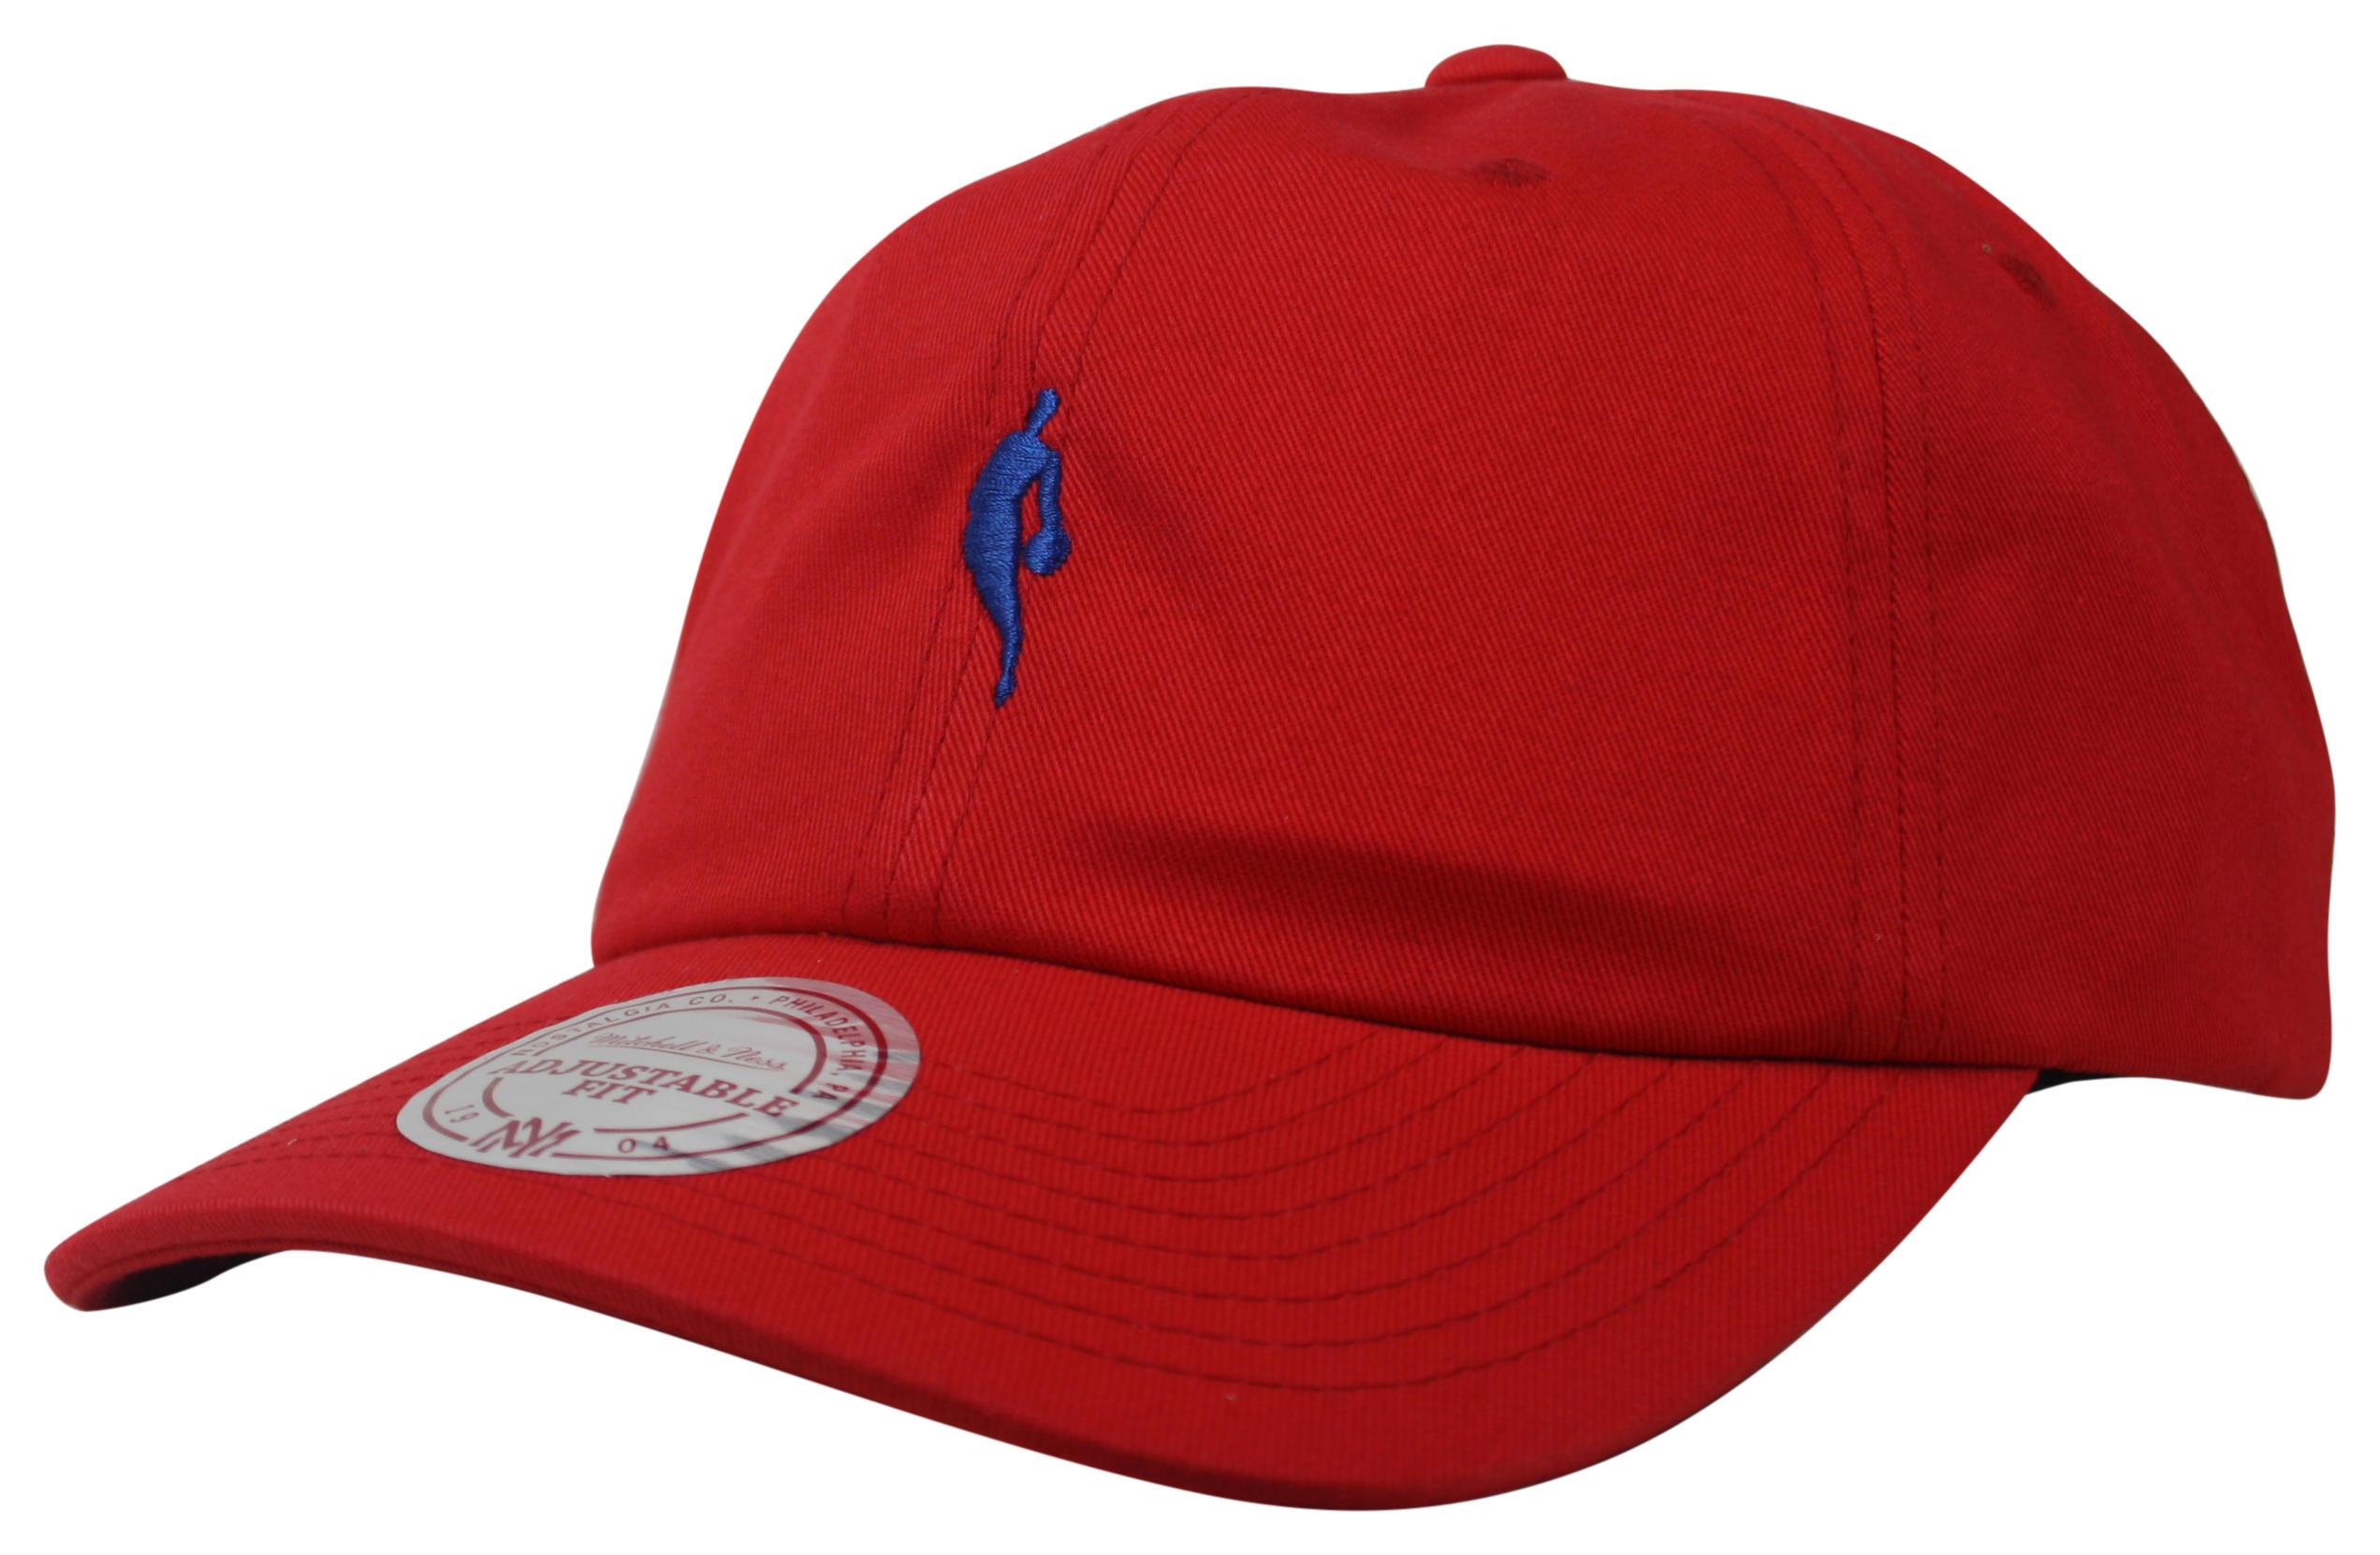 7ecc6e8f Mitchell & Ness | NBA Logoman Red Little Dribbler Dad Hat Snapback